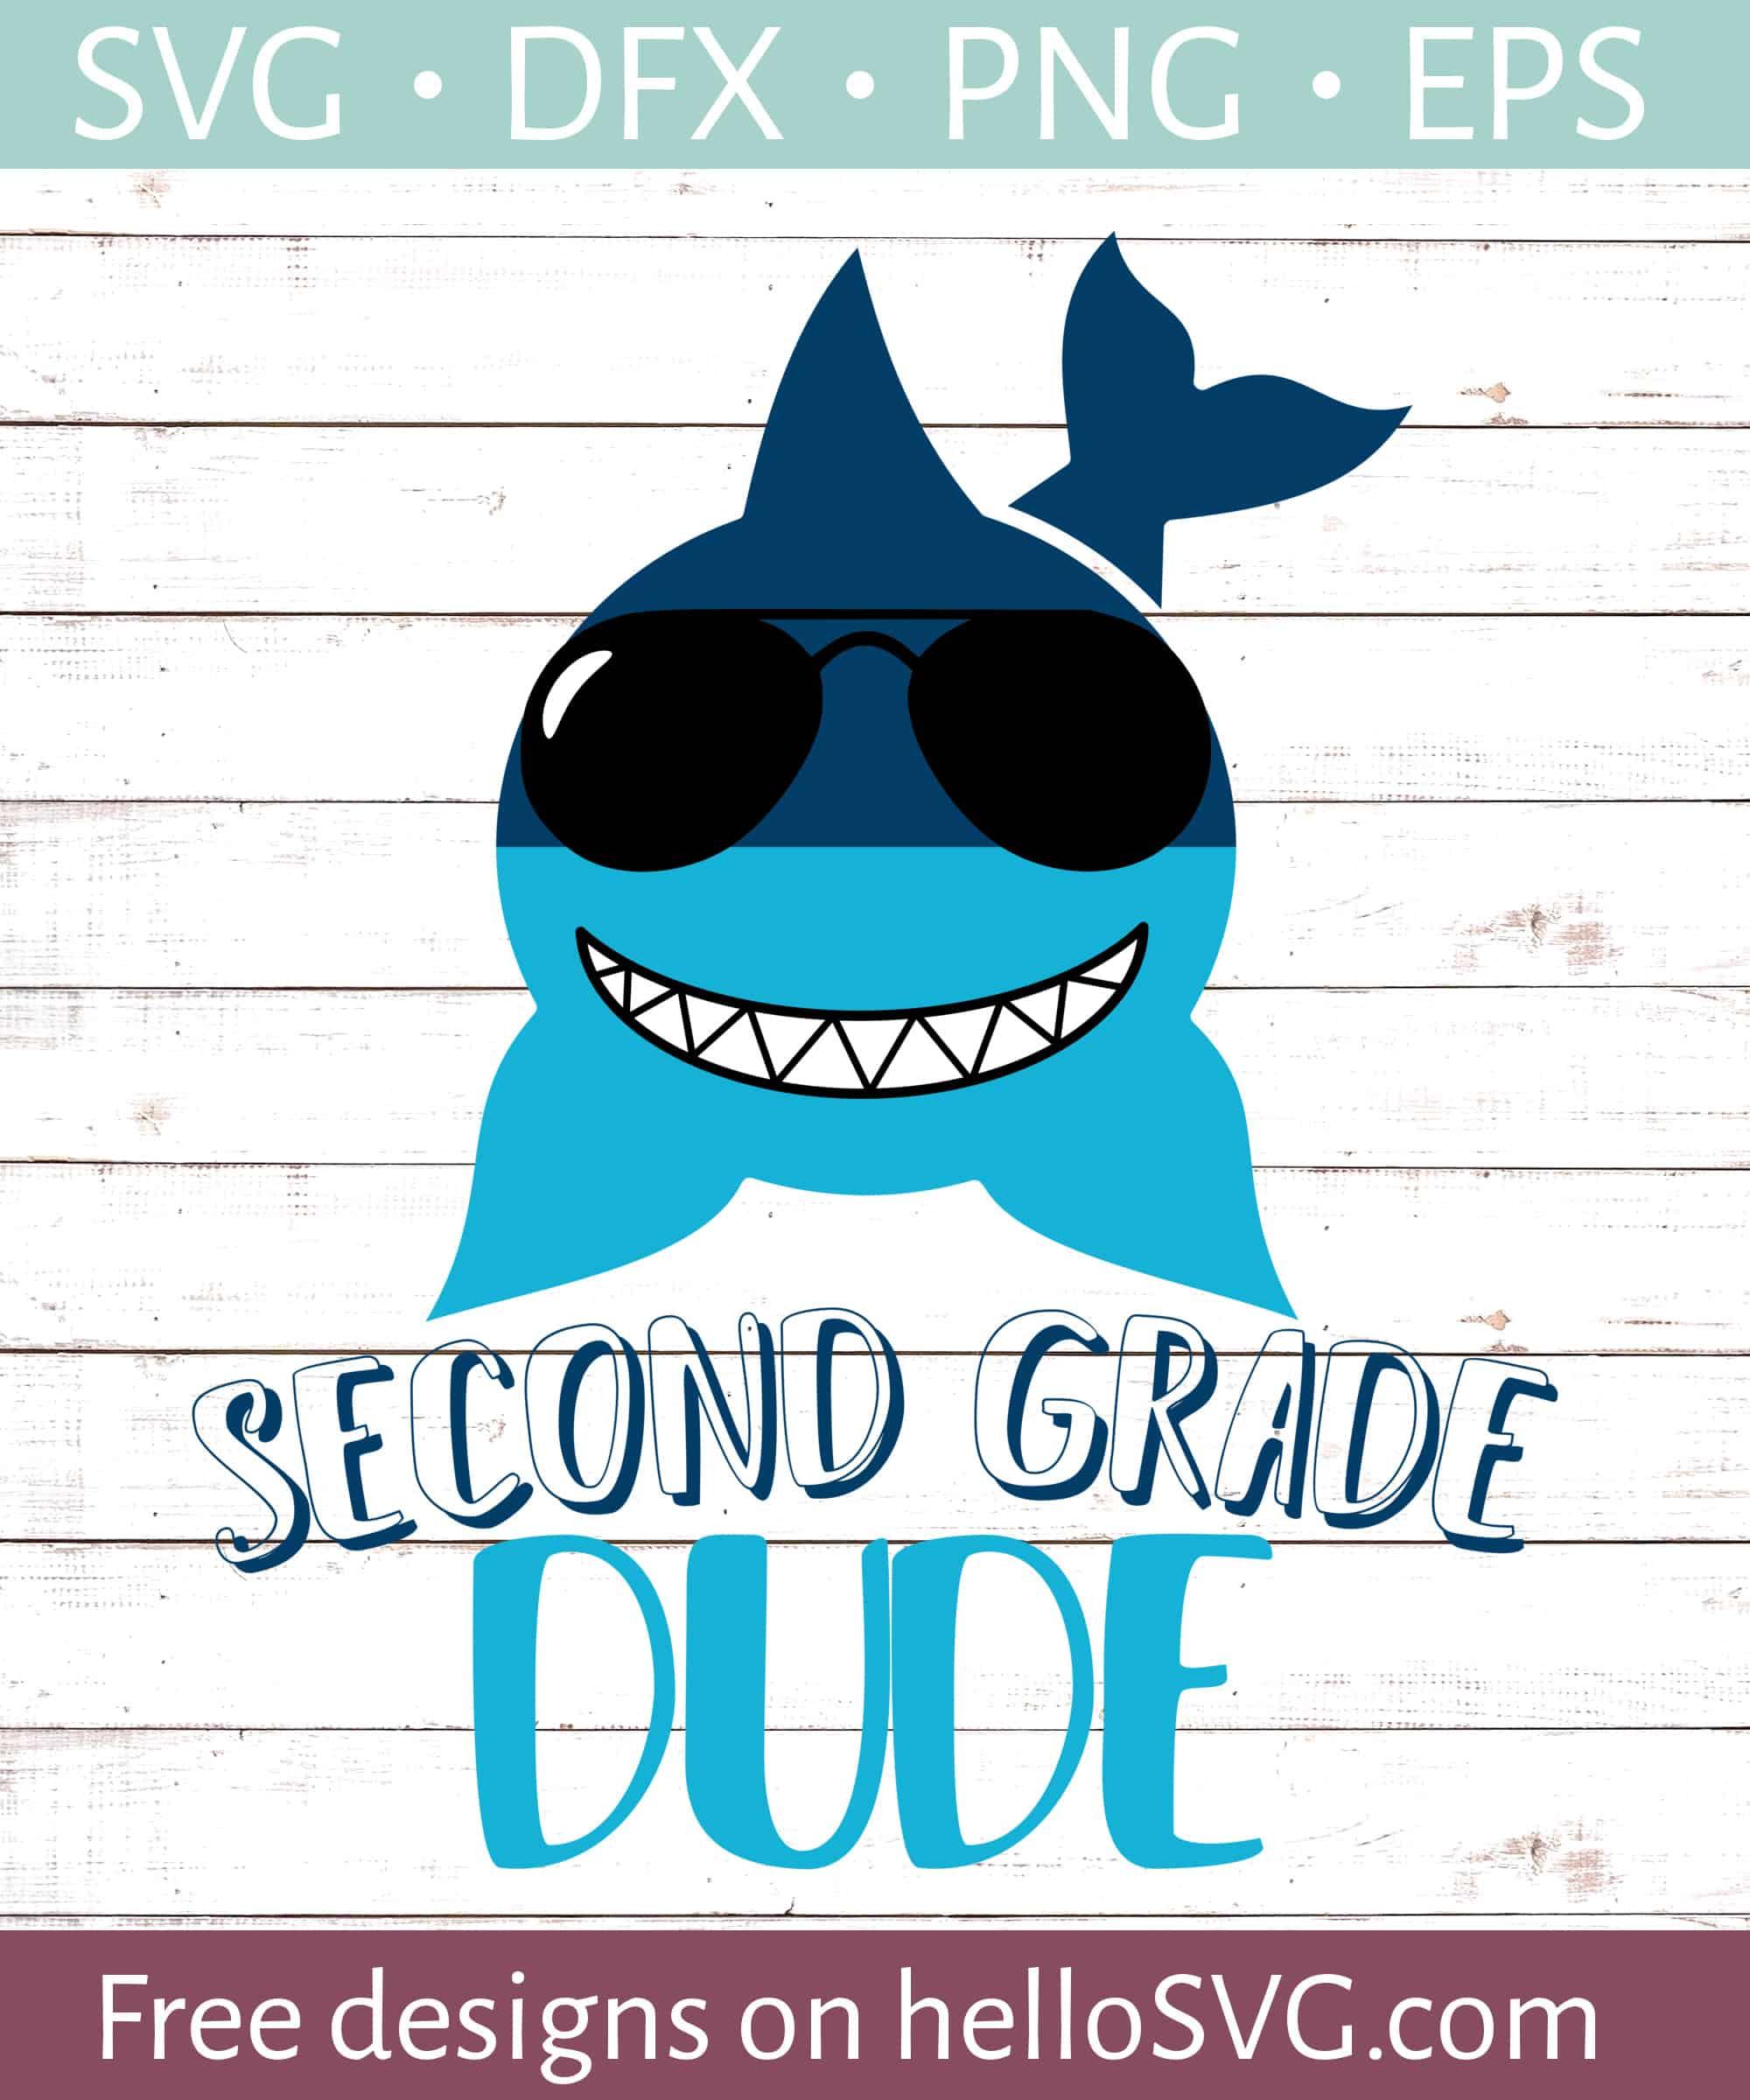 Second Grade Dude